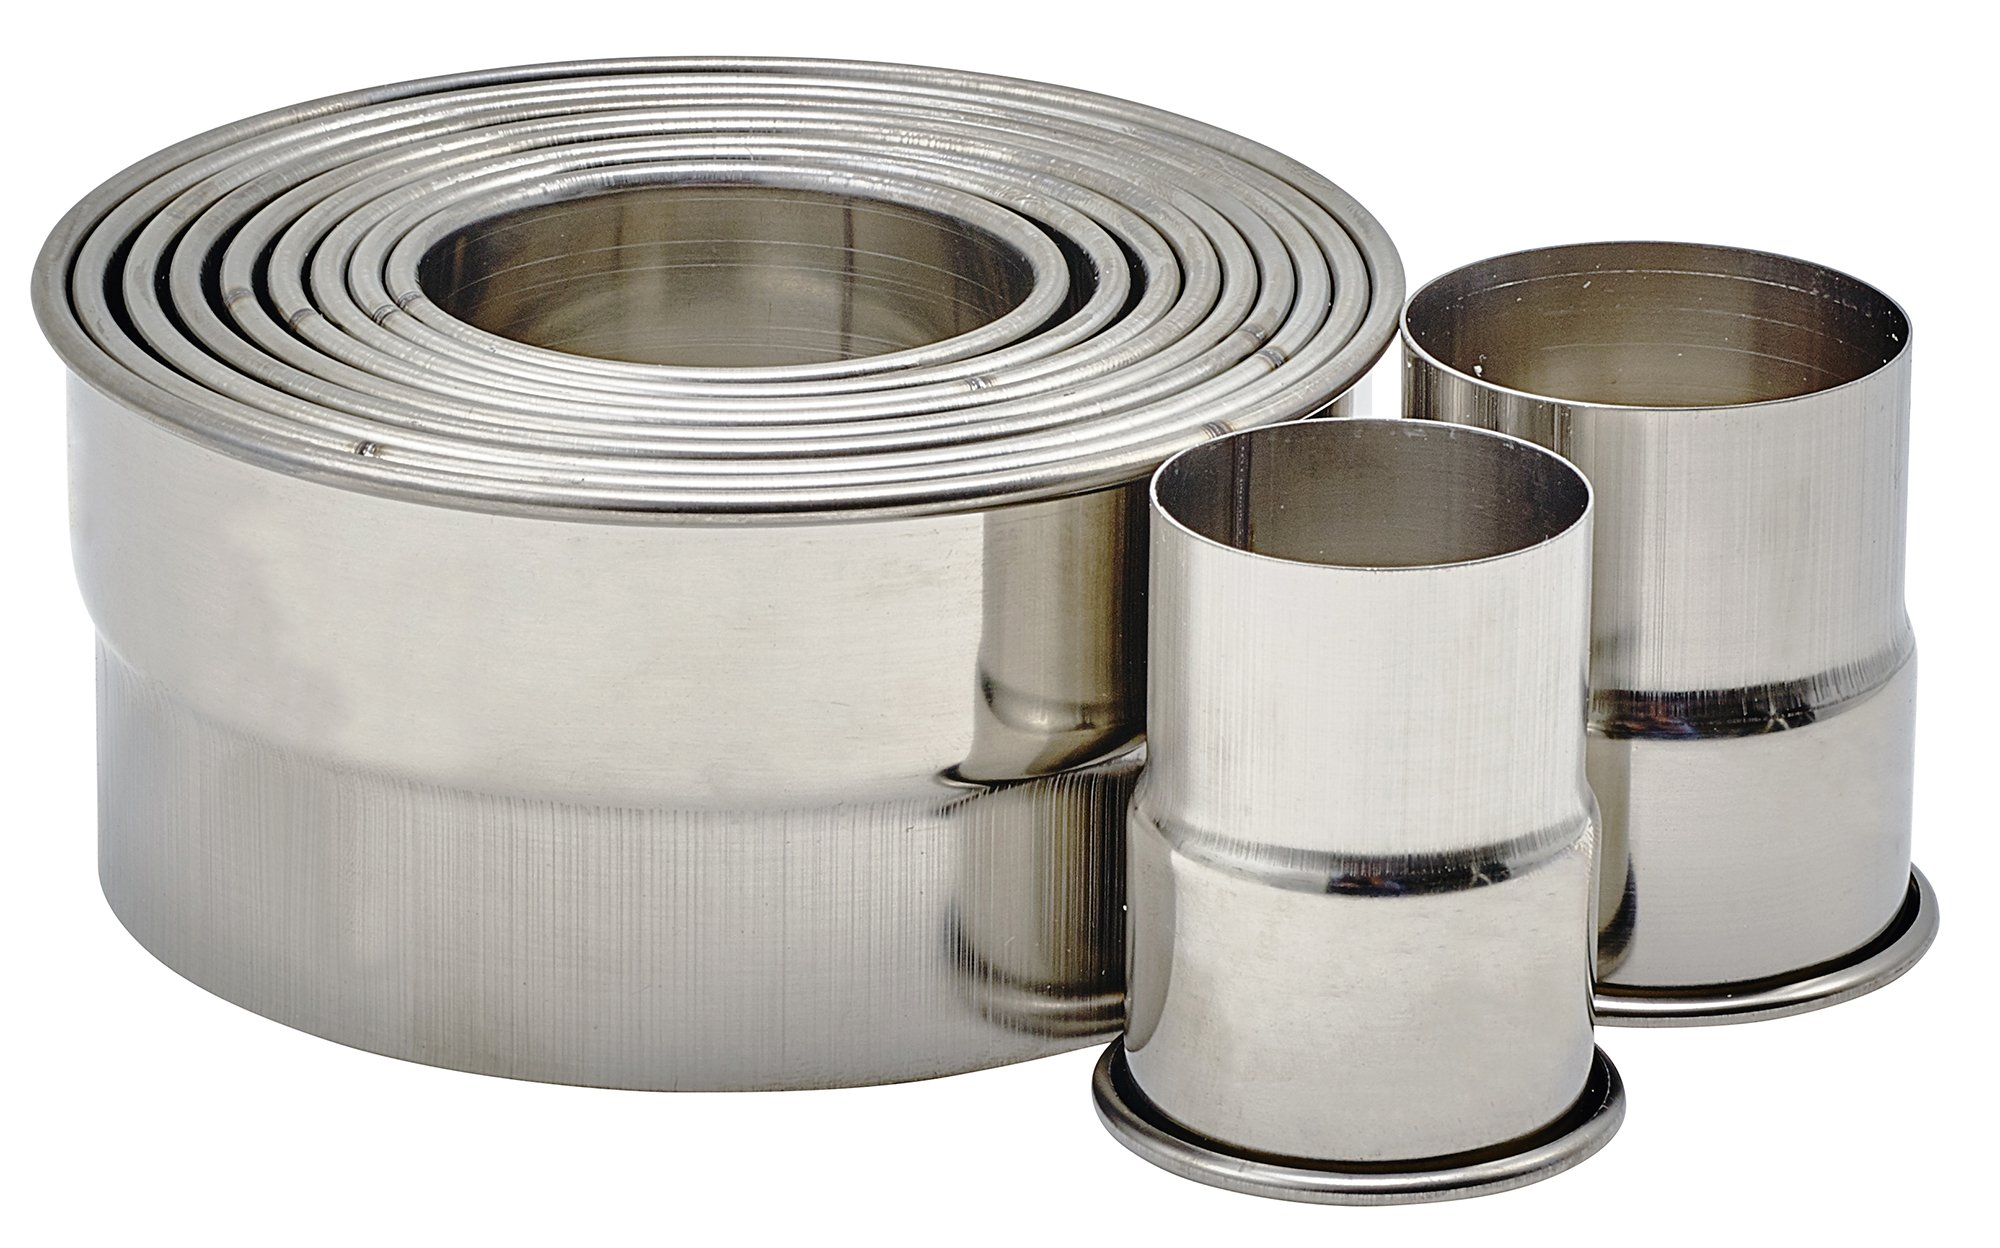 Winco CST-22 11 Piece Heavy Stainless Steel Plain Round 1-3/8'' to 4'' Diameter x 2''H Cookie Cutter Set